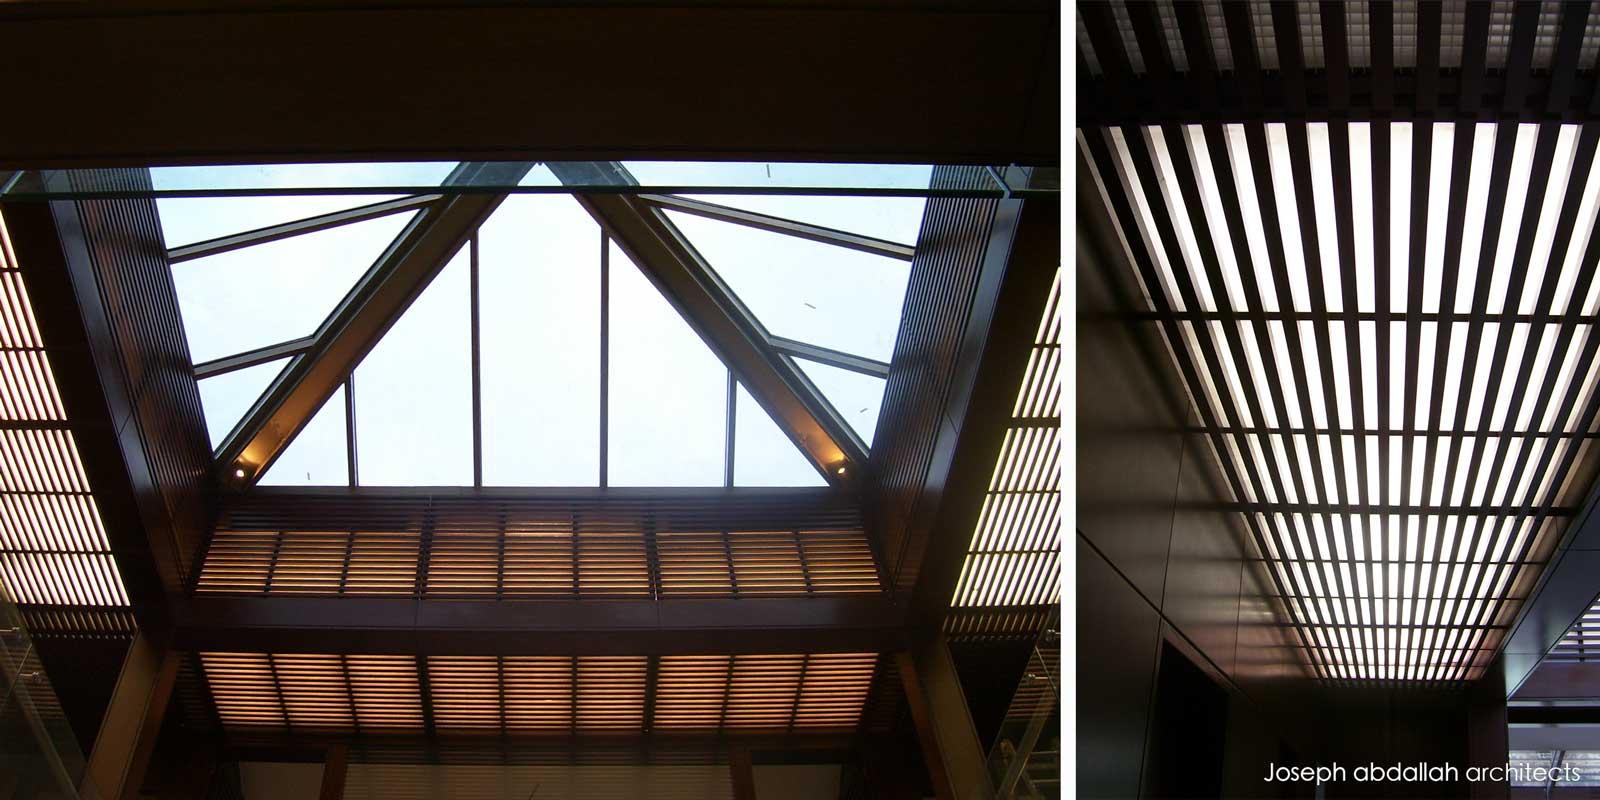 bank-lcb-sgbl-apotres-restoration-architecture-joseph-abdallah-architects-15